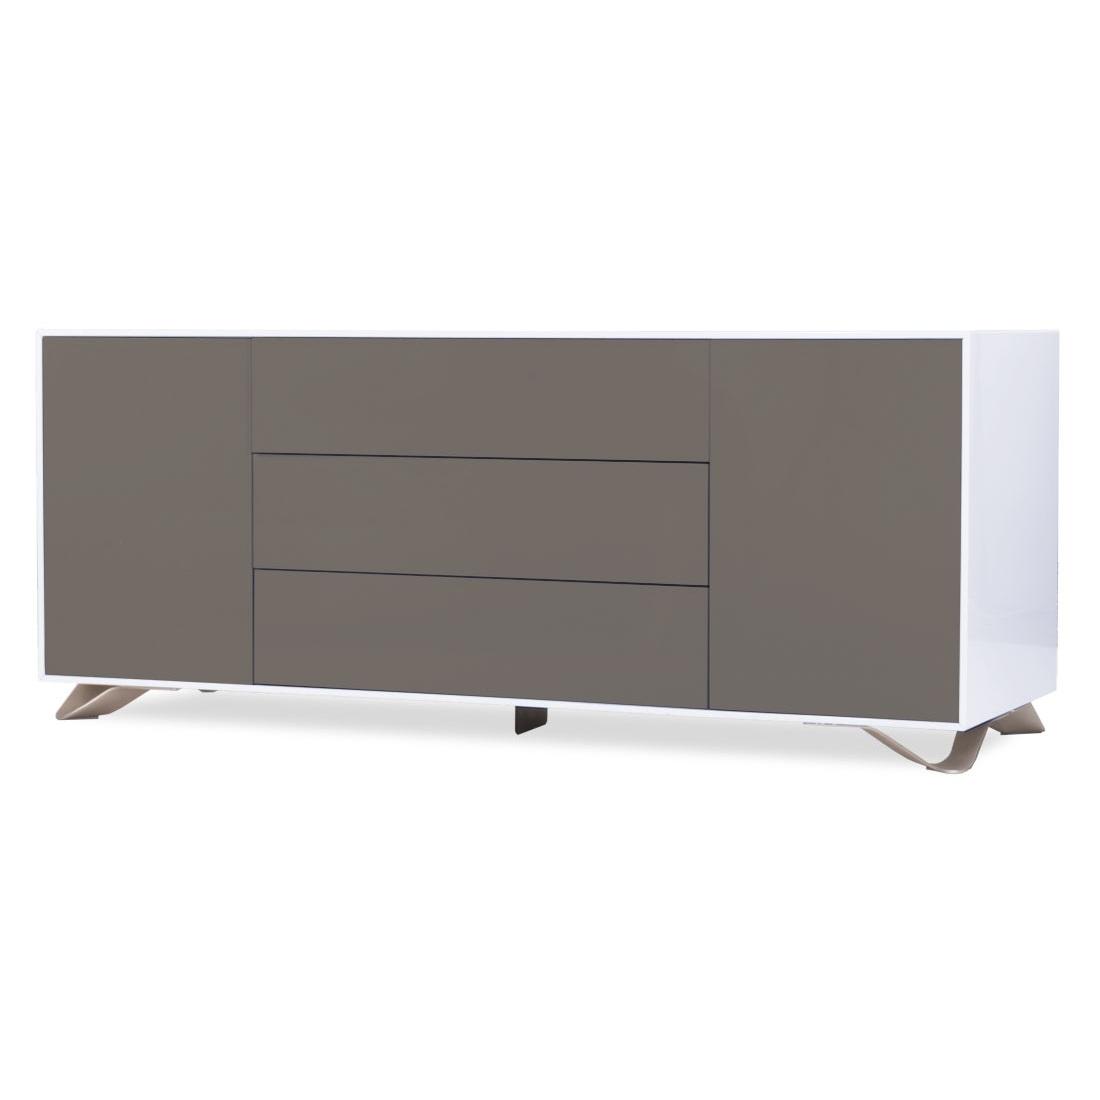 Sideboard Weiß-Grau TV Schrank Lowboard Anrichte - moebel-Liebe.com